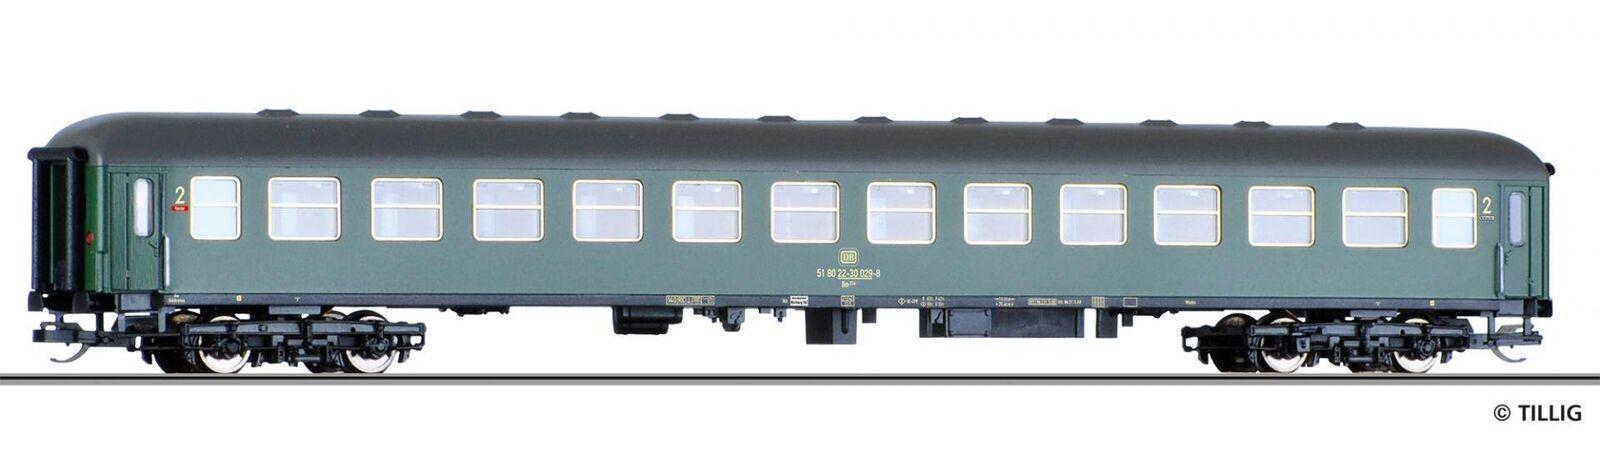 Tillig 16208 viaggiatori 2. classe BM 235 della DB, Ep. IV